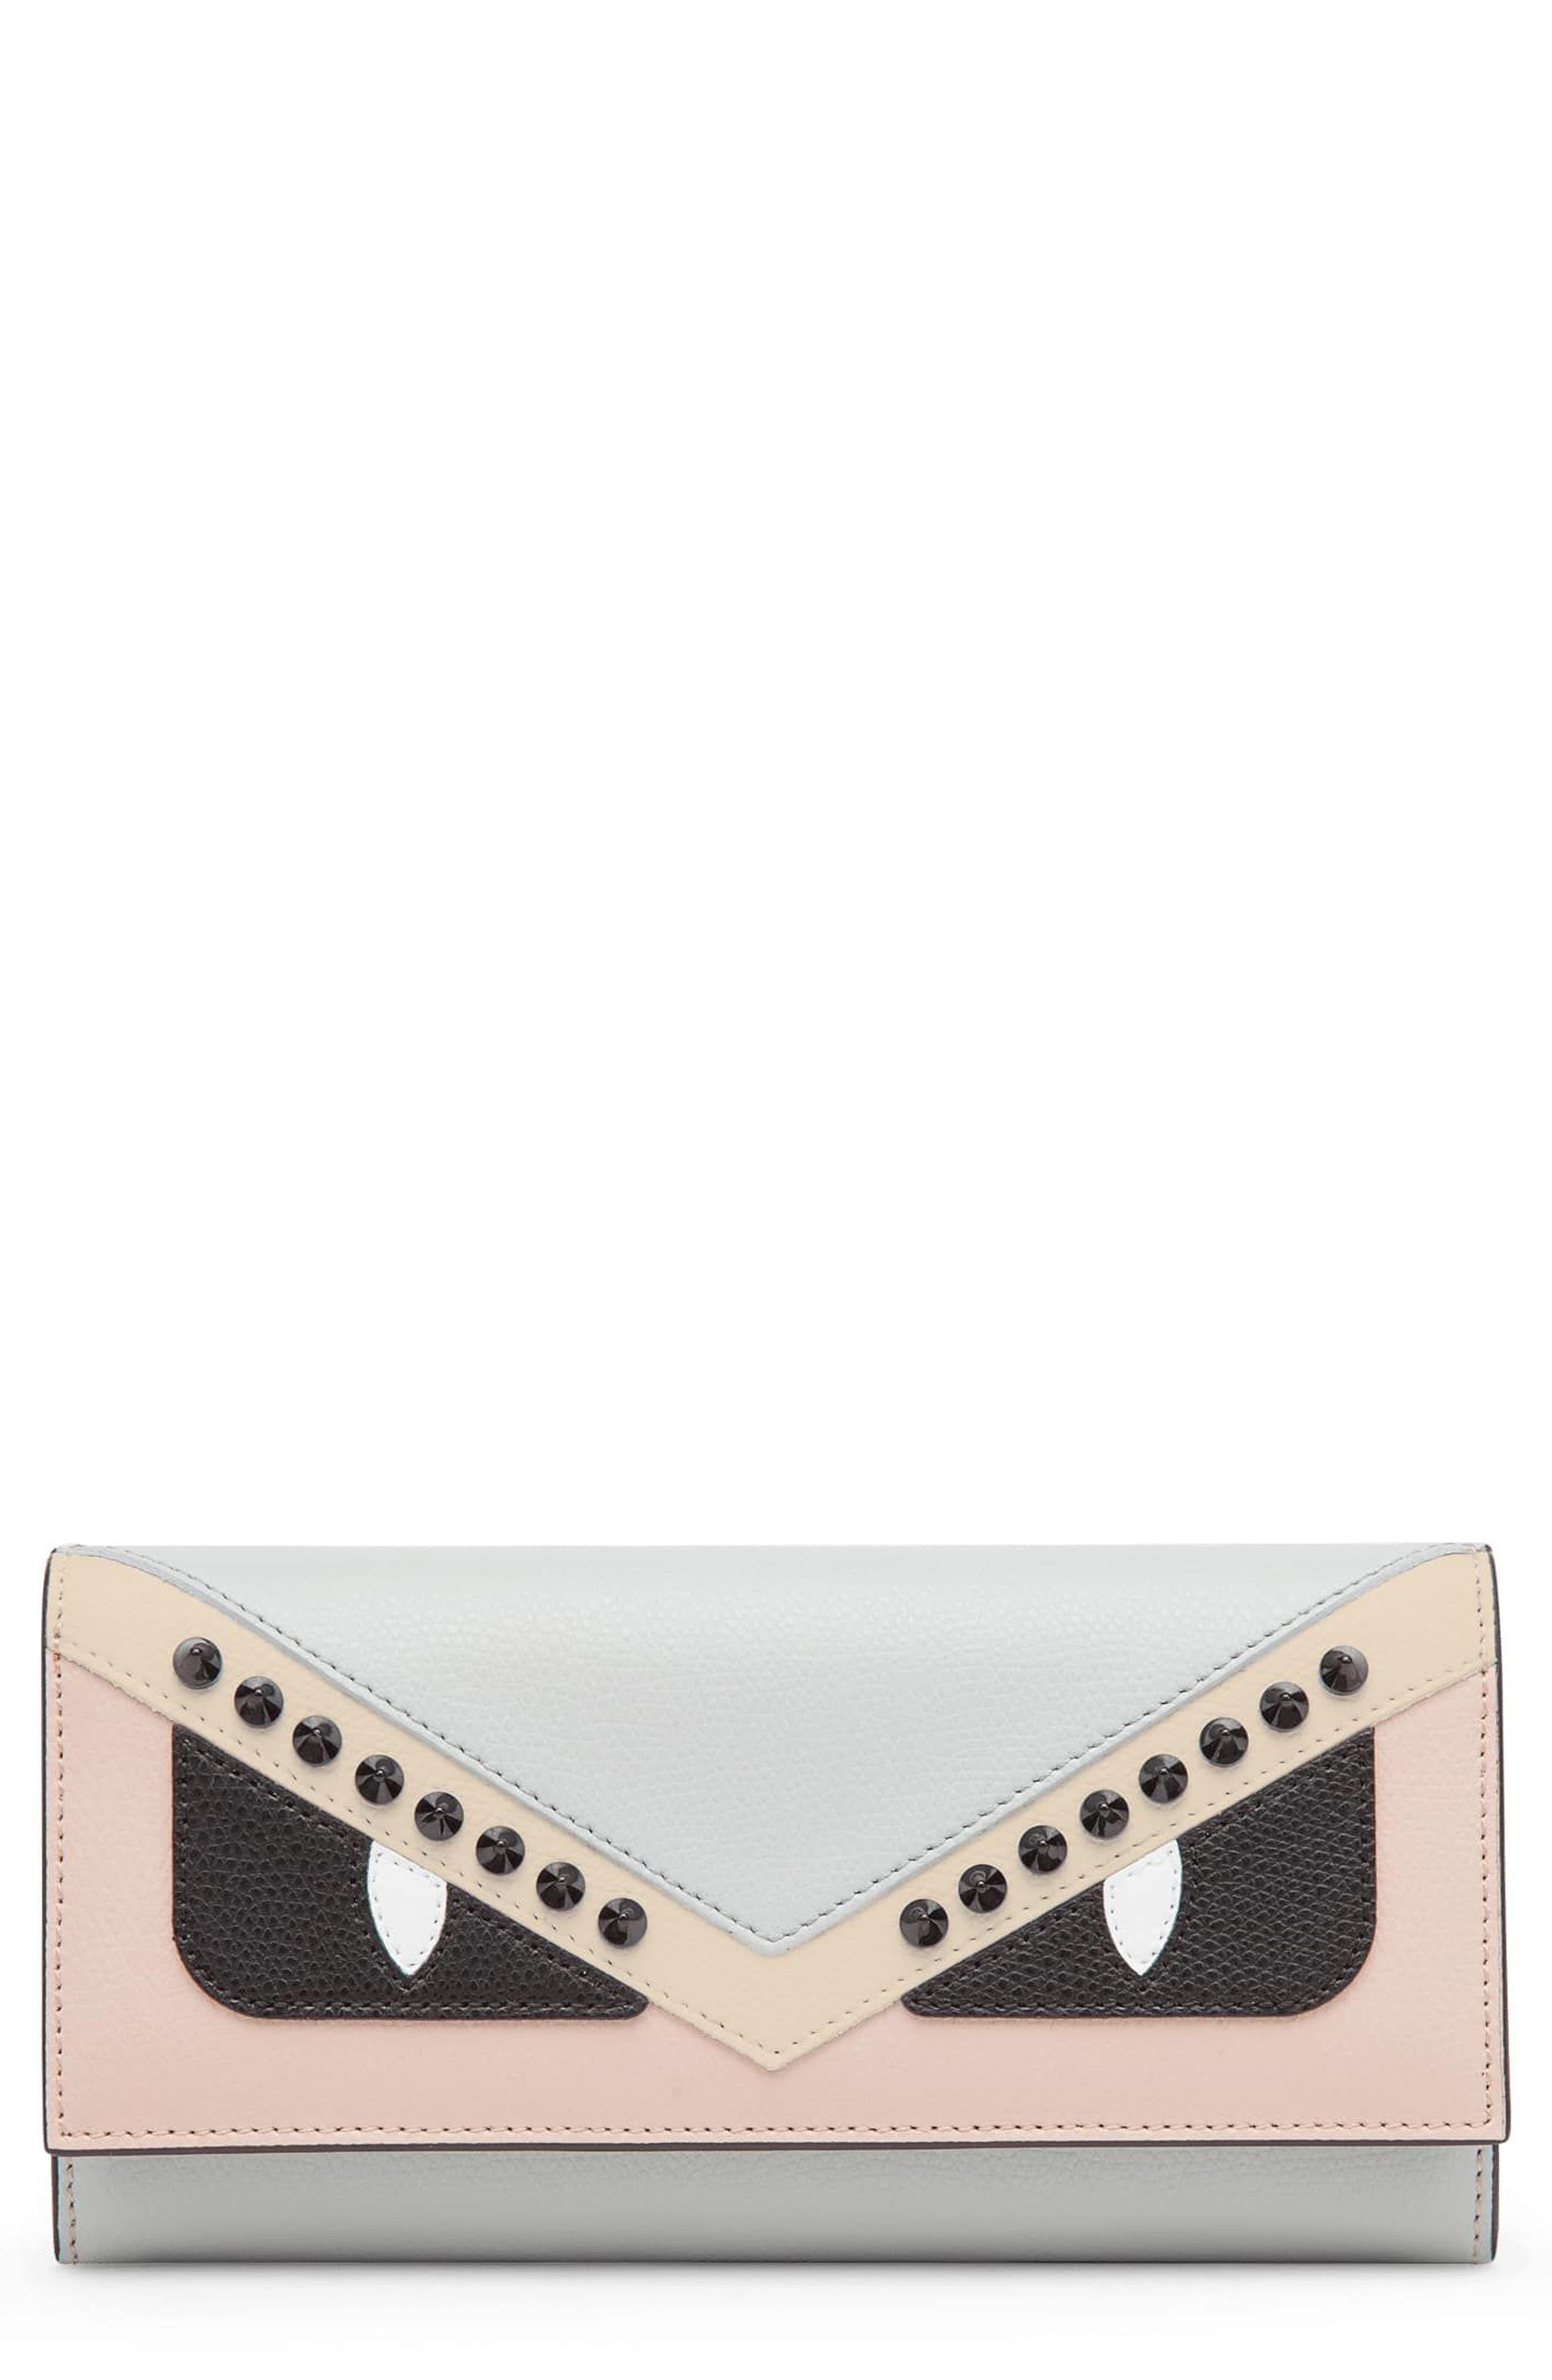 Monster Leather Continental Wallet,                             Main thumbnail 1, color,                             Grigio Perla/ Soap Multi